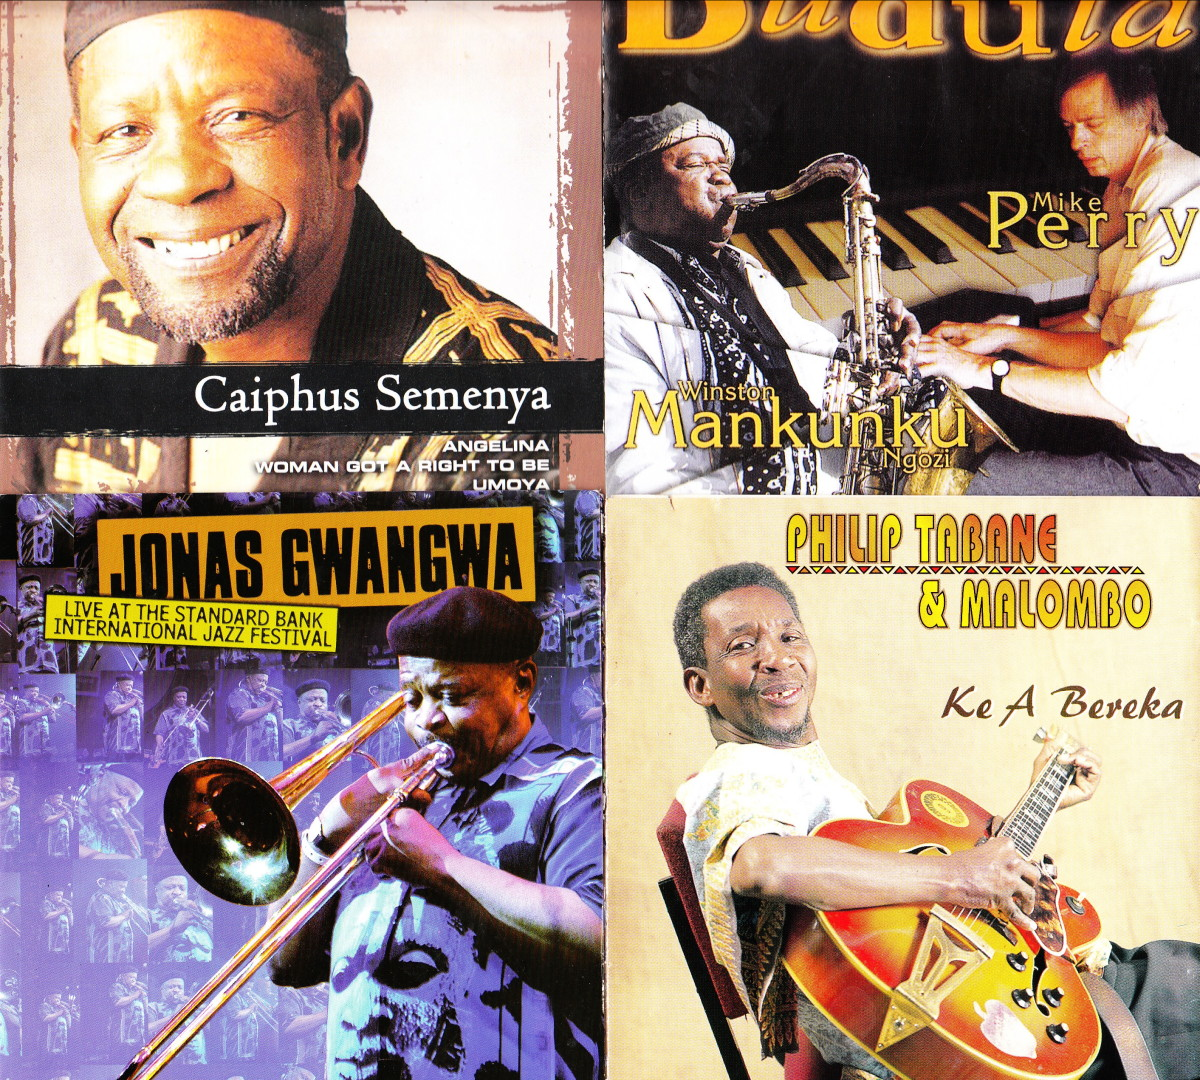 Caiphus Semenya; Winston Manunku Ngozi; Jonas Gwangwa; Phillip Tabane